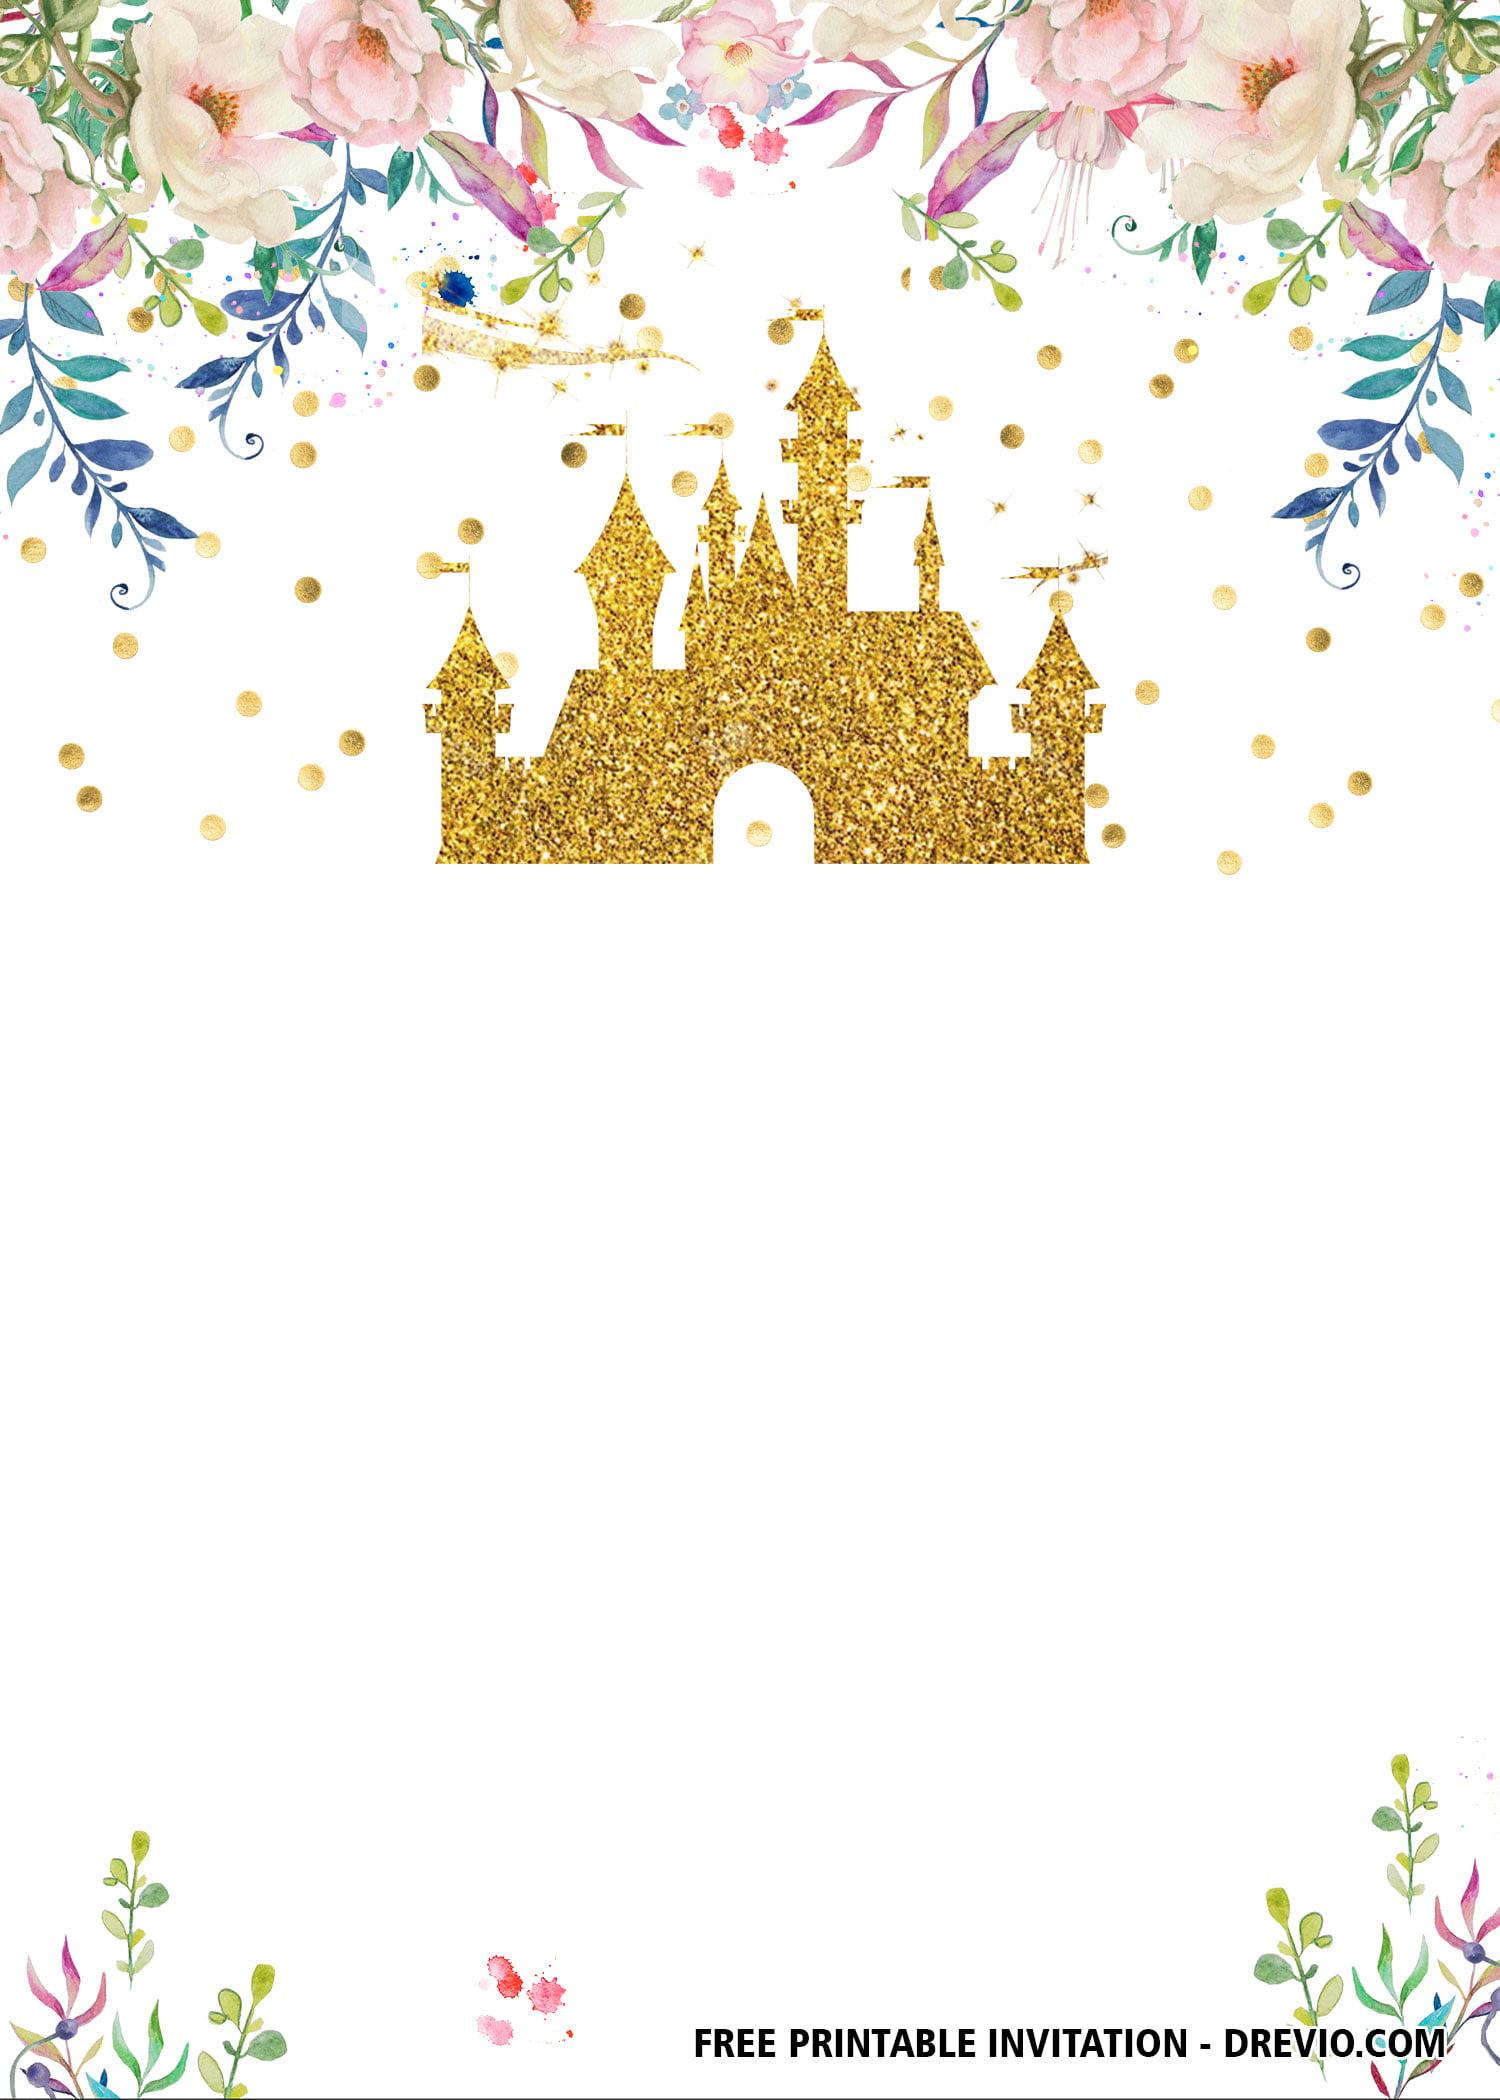 Free Printable Princess Baby Shower And Birthday Invitation